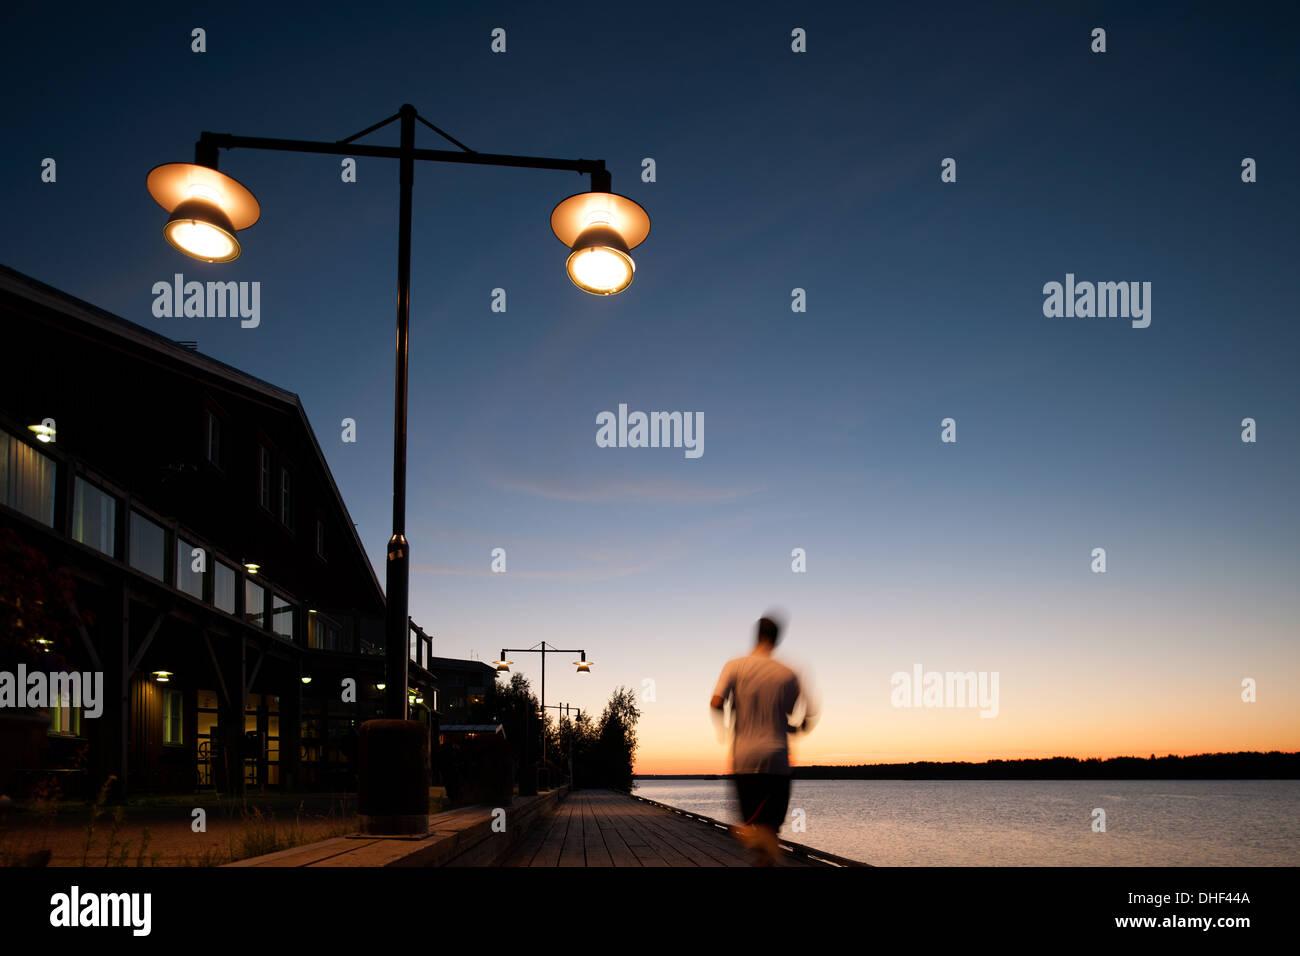 Man jogging on waterfront, Lulea, Sweden - Stock Image